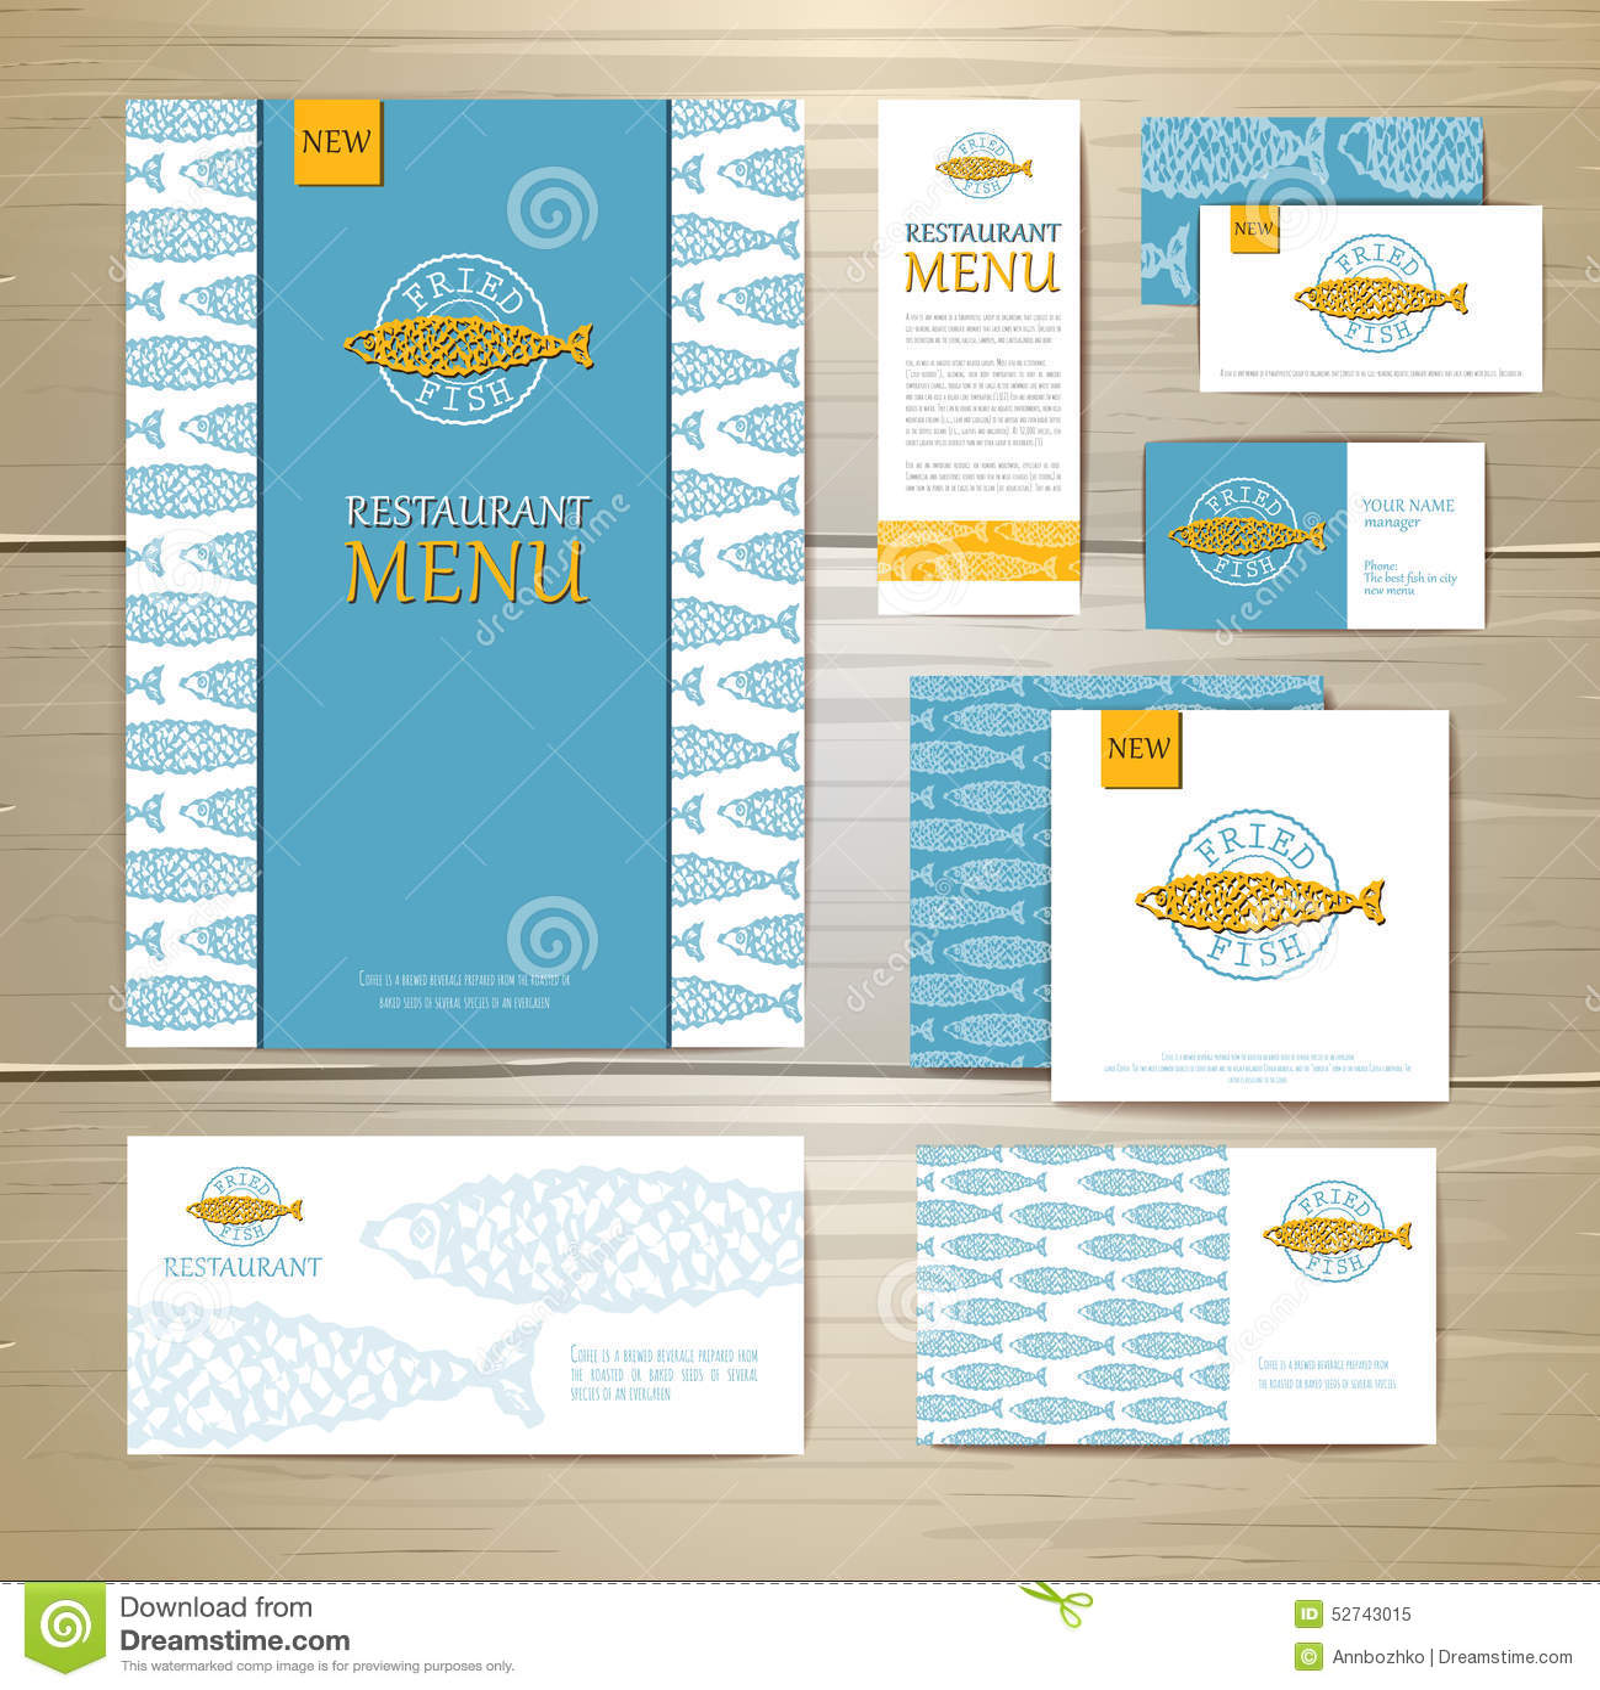 Fried Fish Restaurant Menu Concept Design Corporate Identity Stock Vector Illustration Of